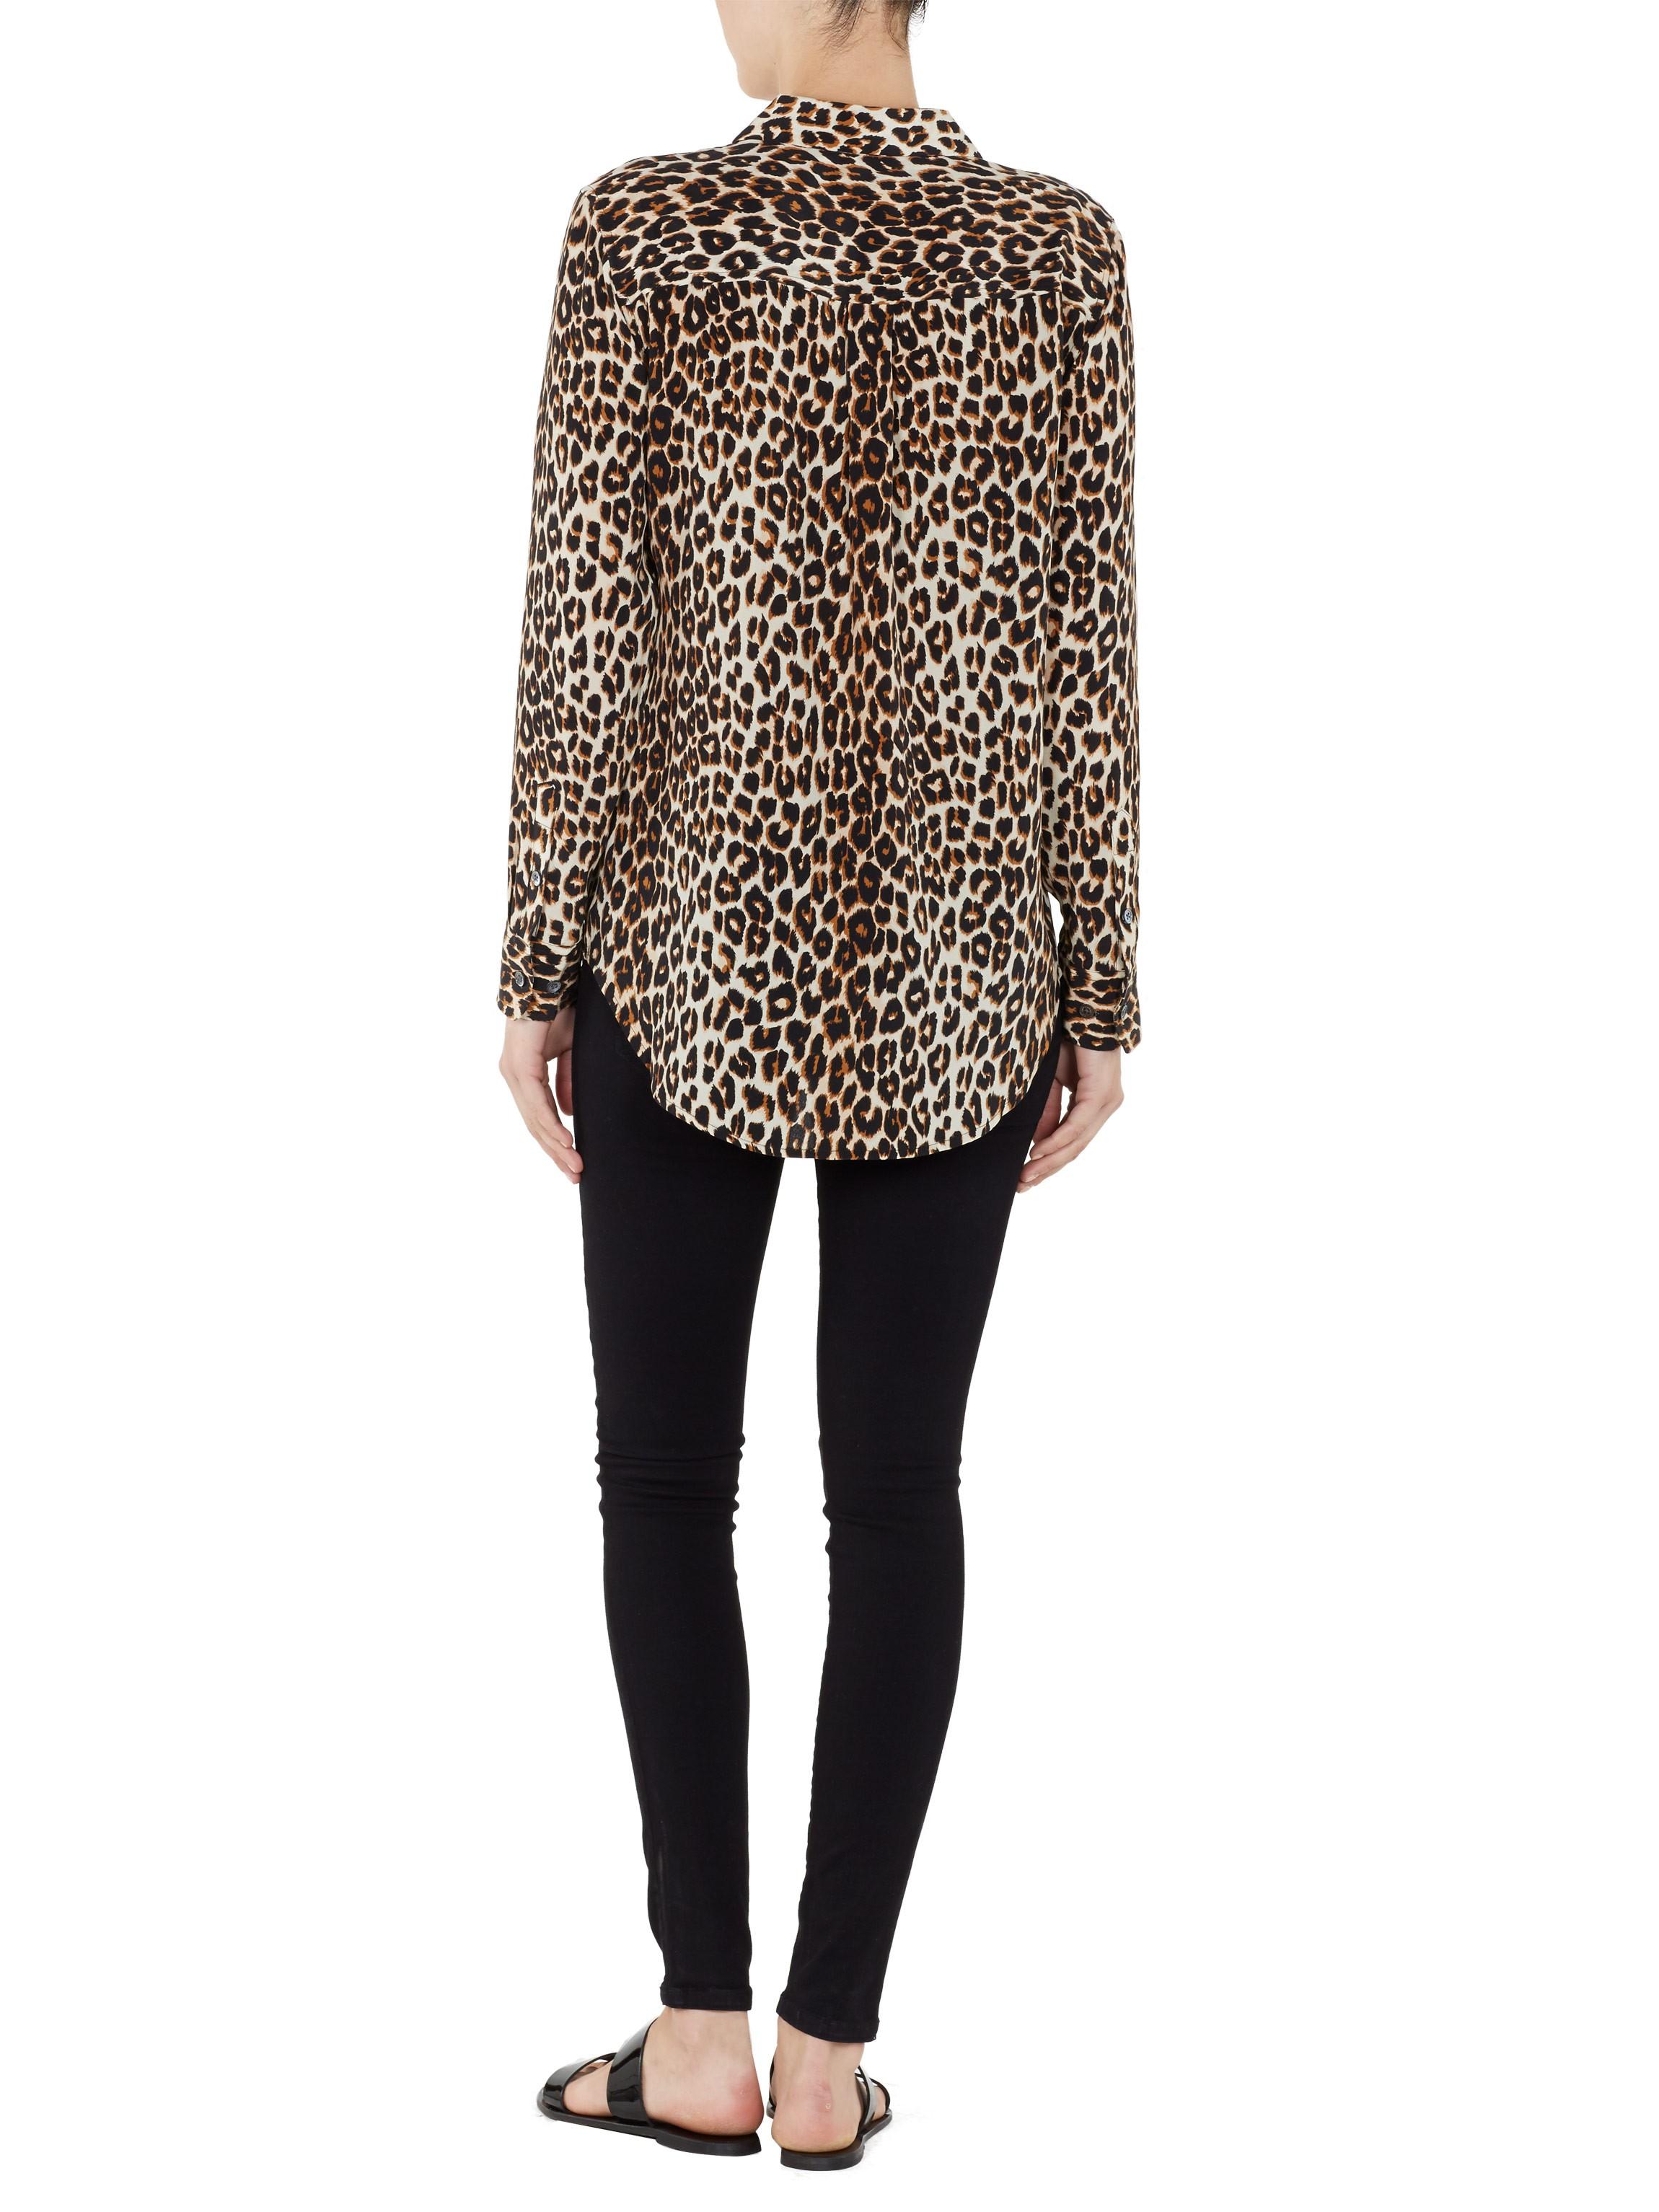 062316312142 EQUIPMENT Slim Signature Natural Leopard Print